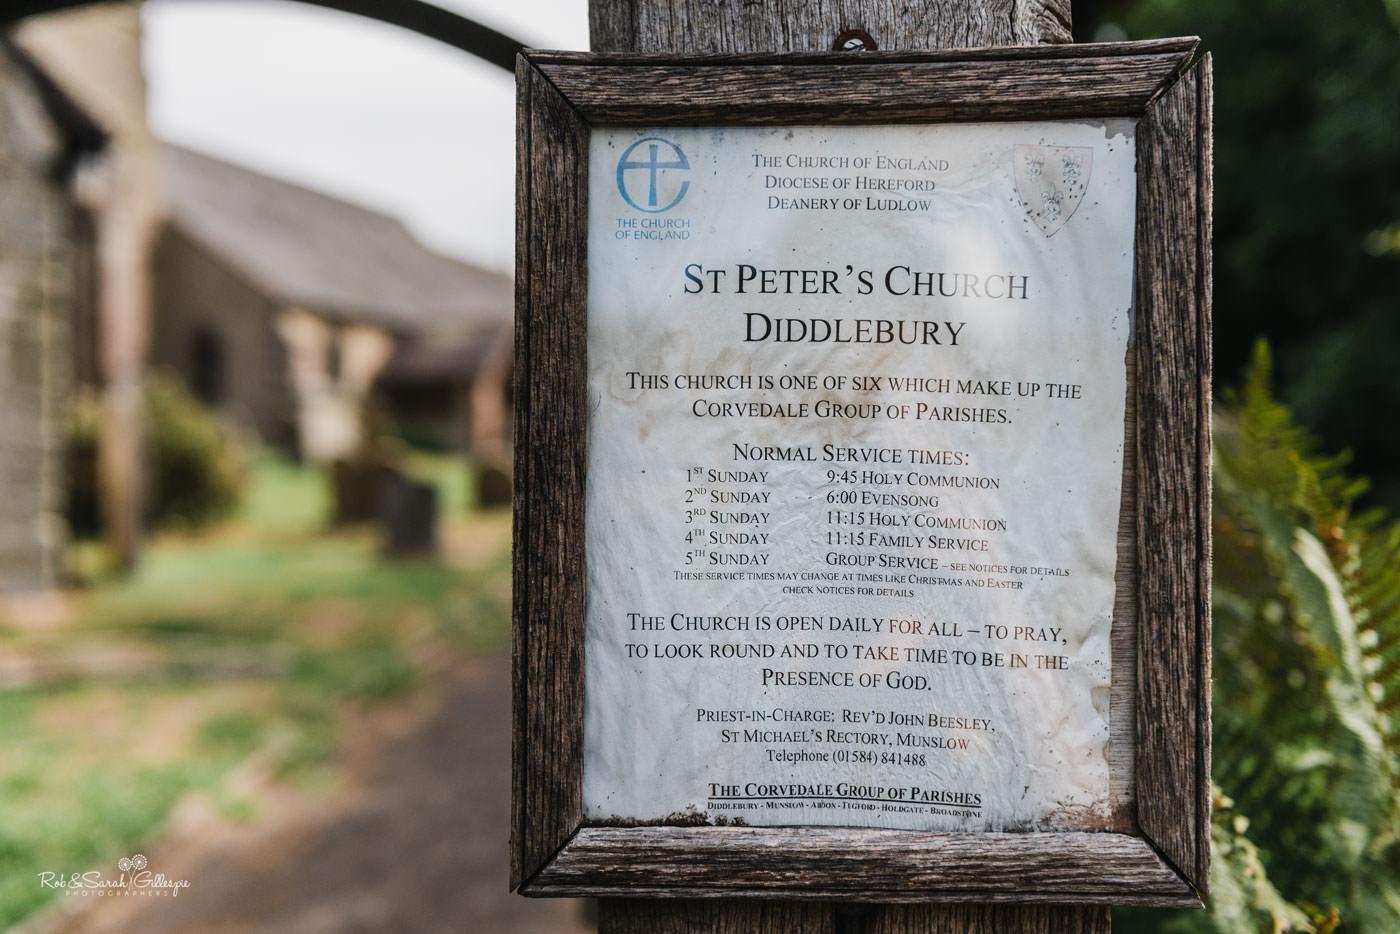 St Peter's Church Diddlebury near Delbury Hall